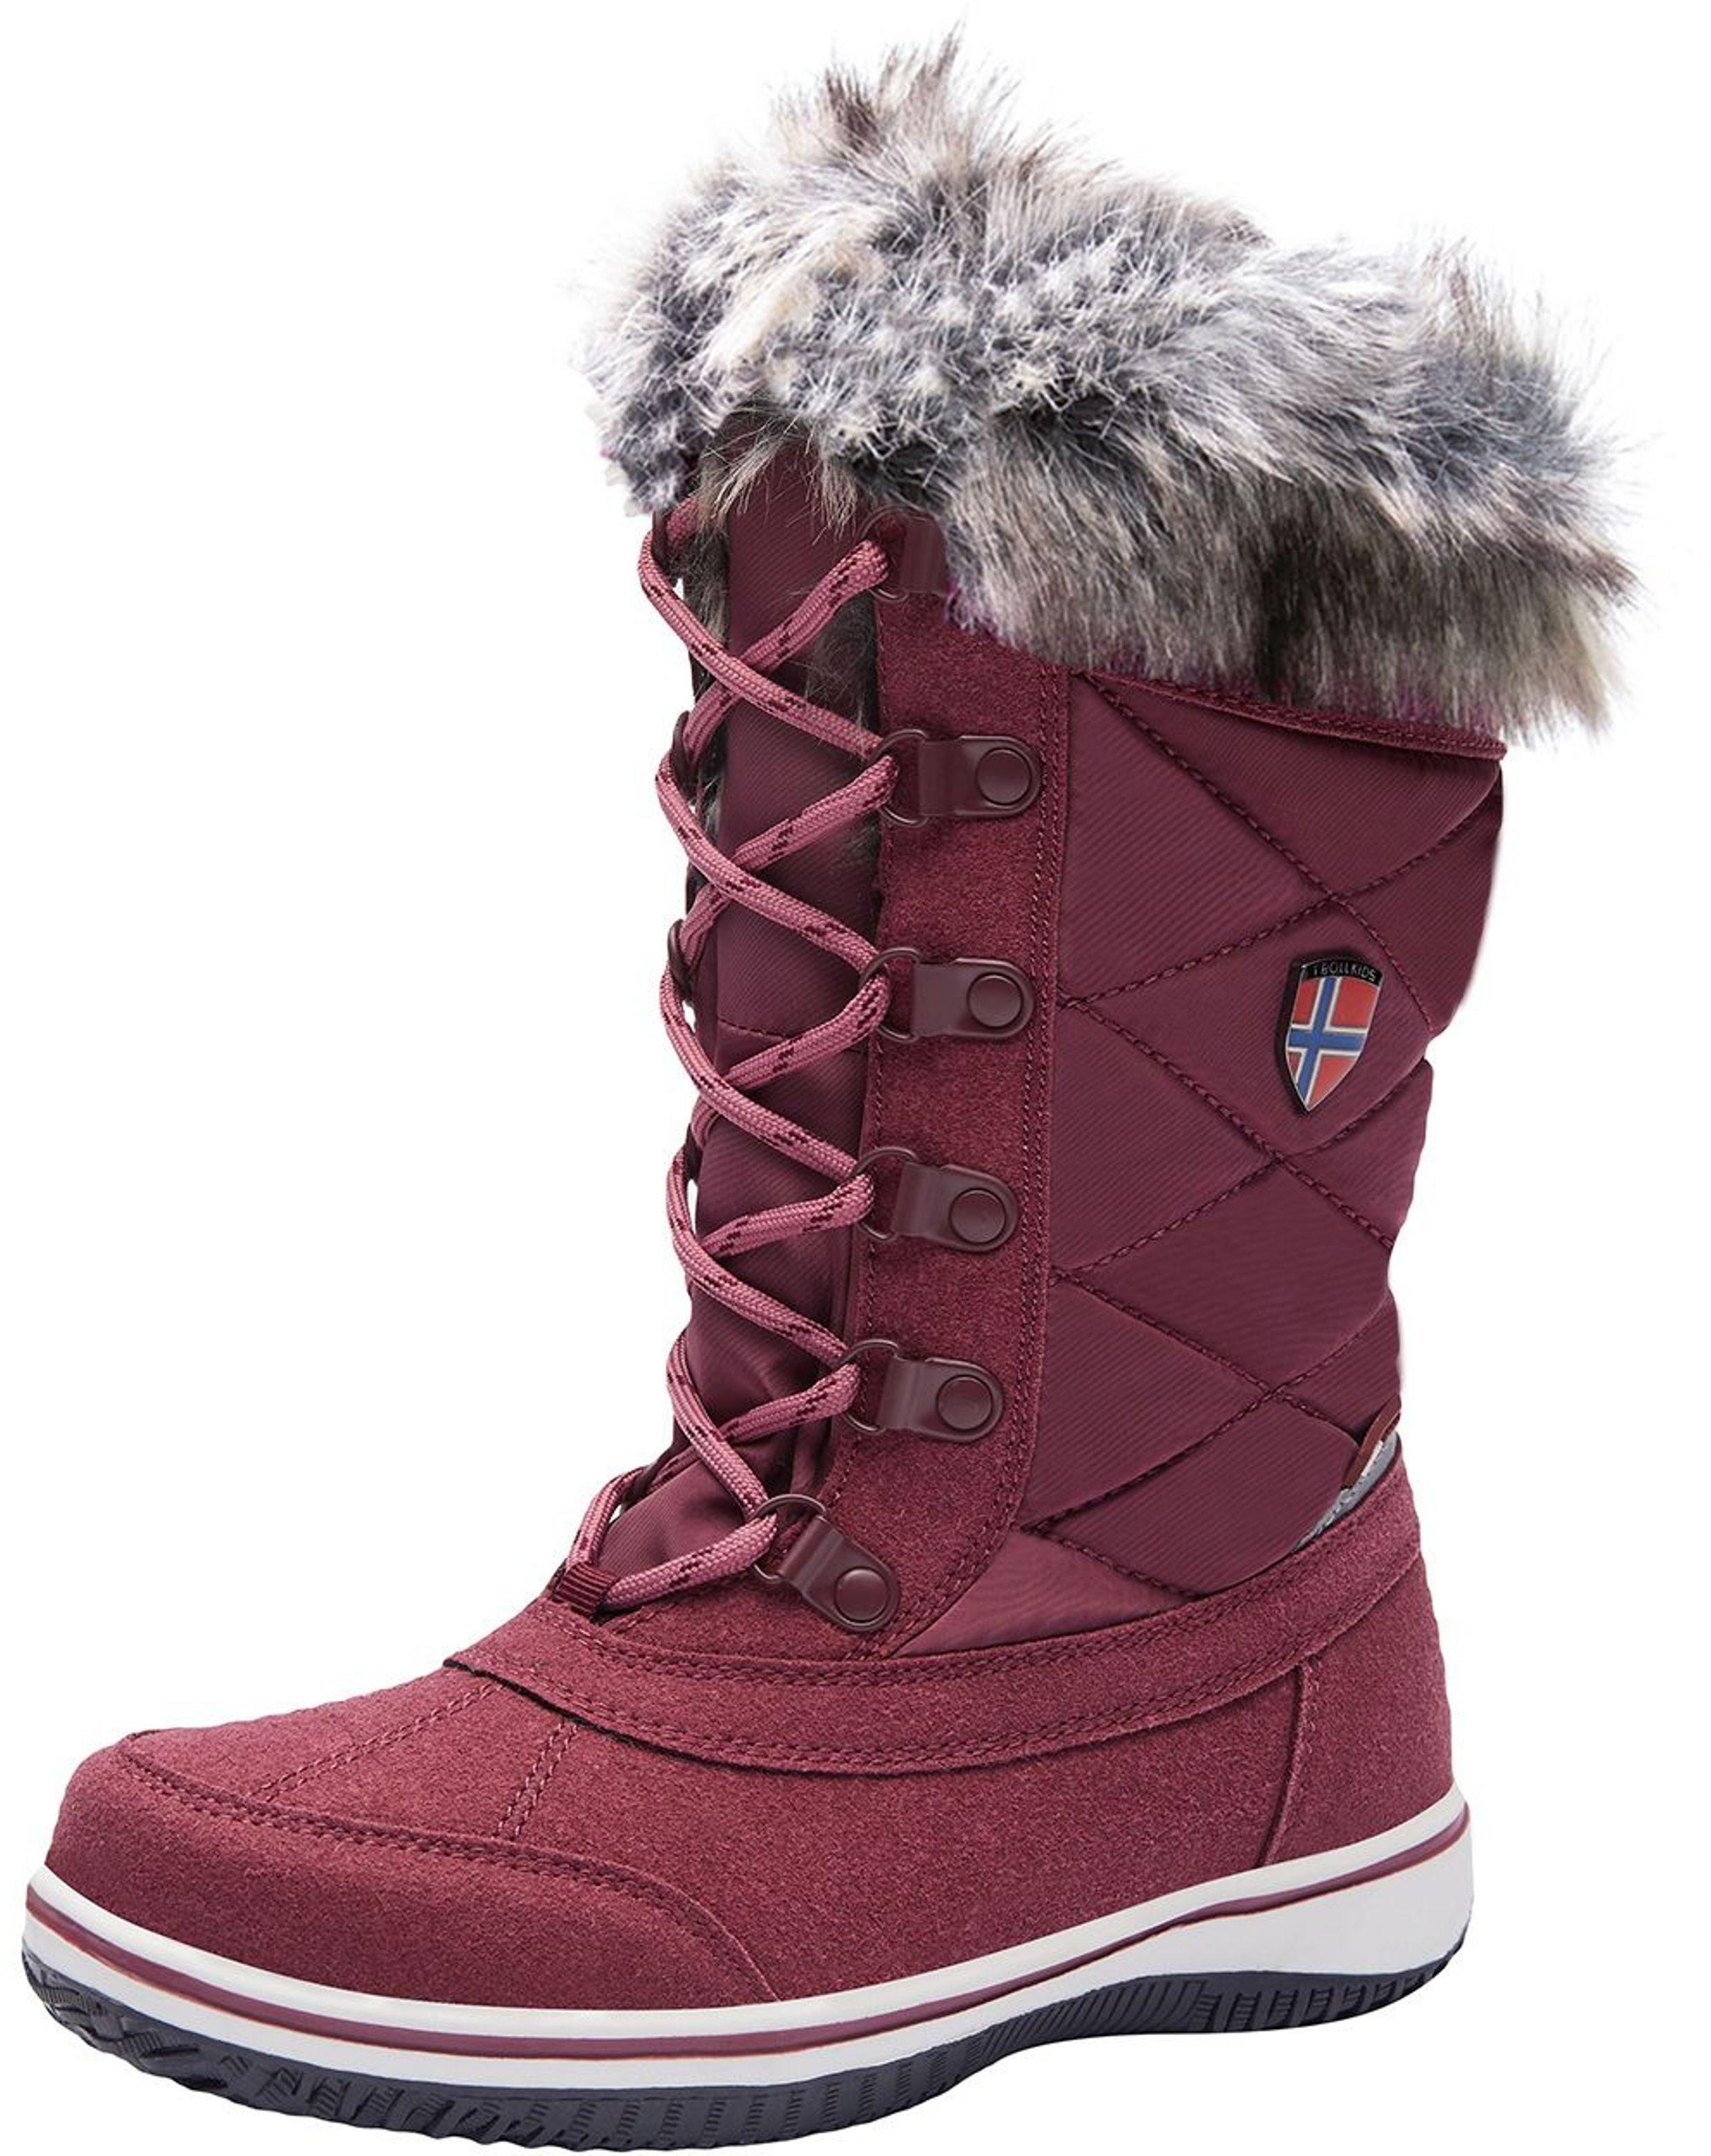 Trollkids Girls Holmenkollen Snow Boots Maroon Red